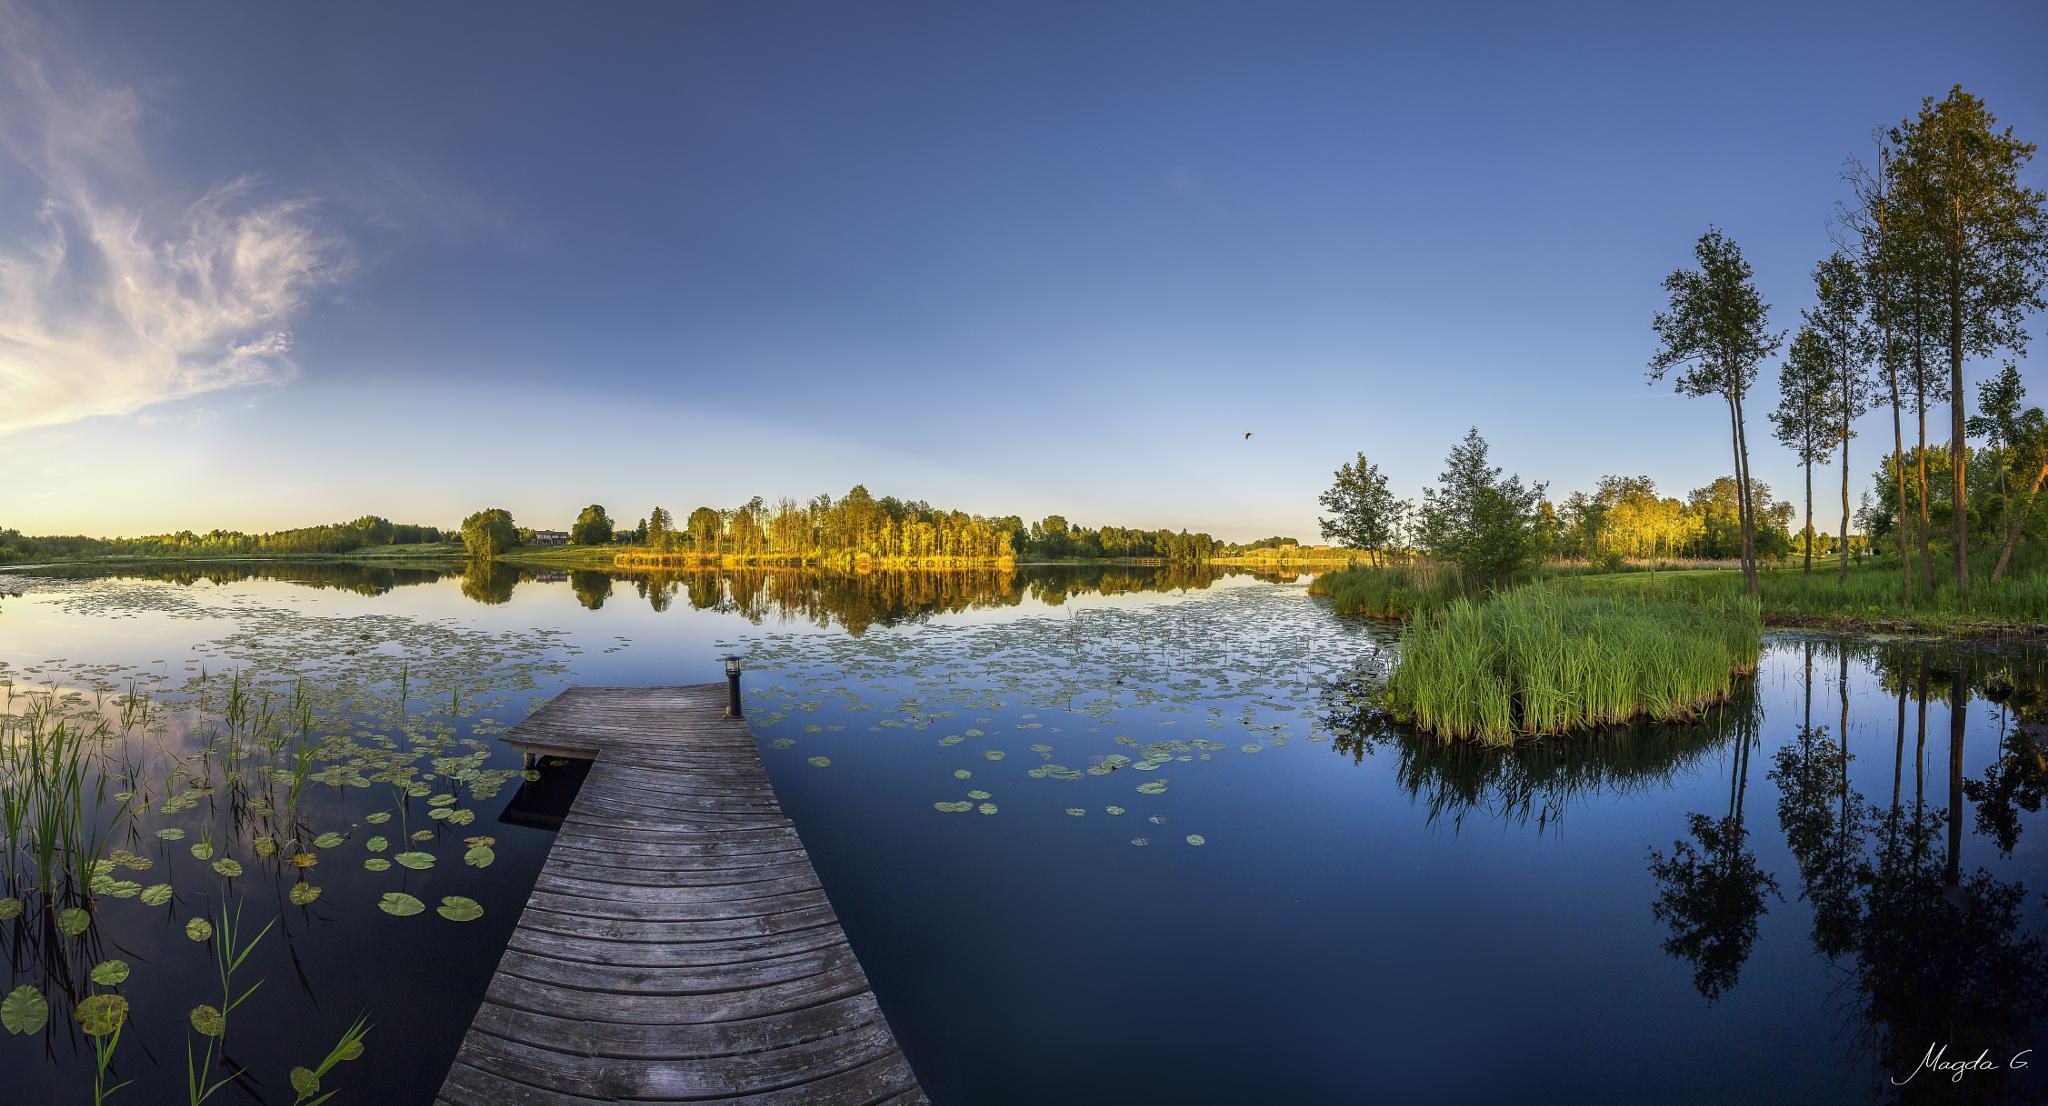 Midsummer  by Magda Grigonienė